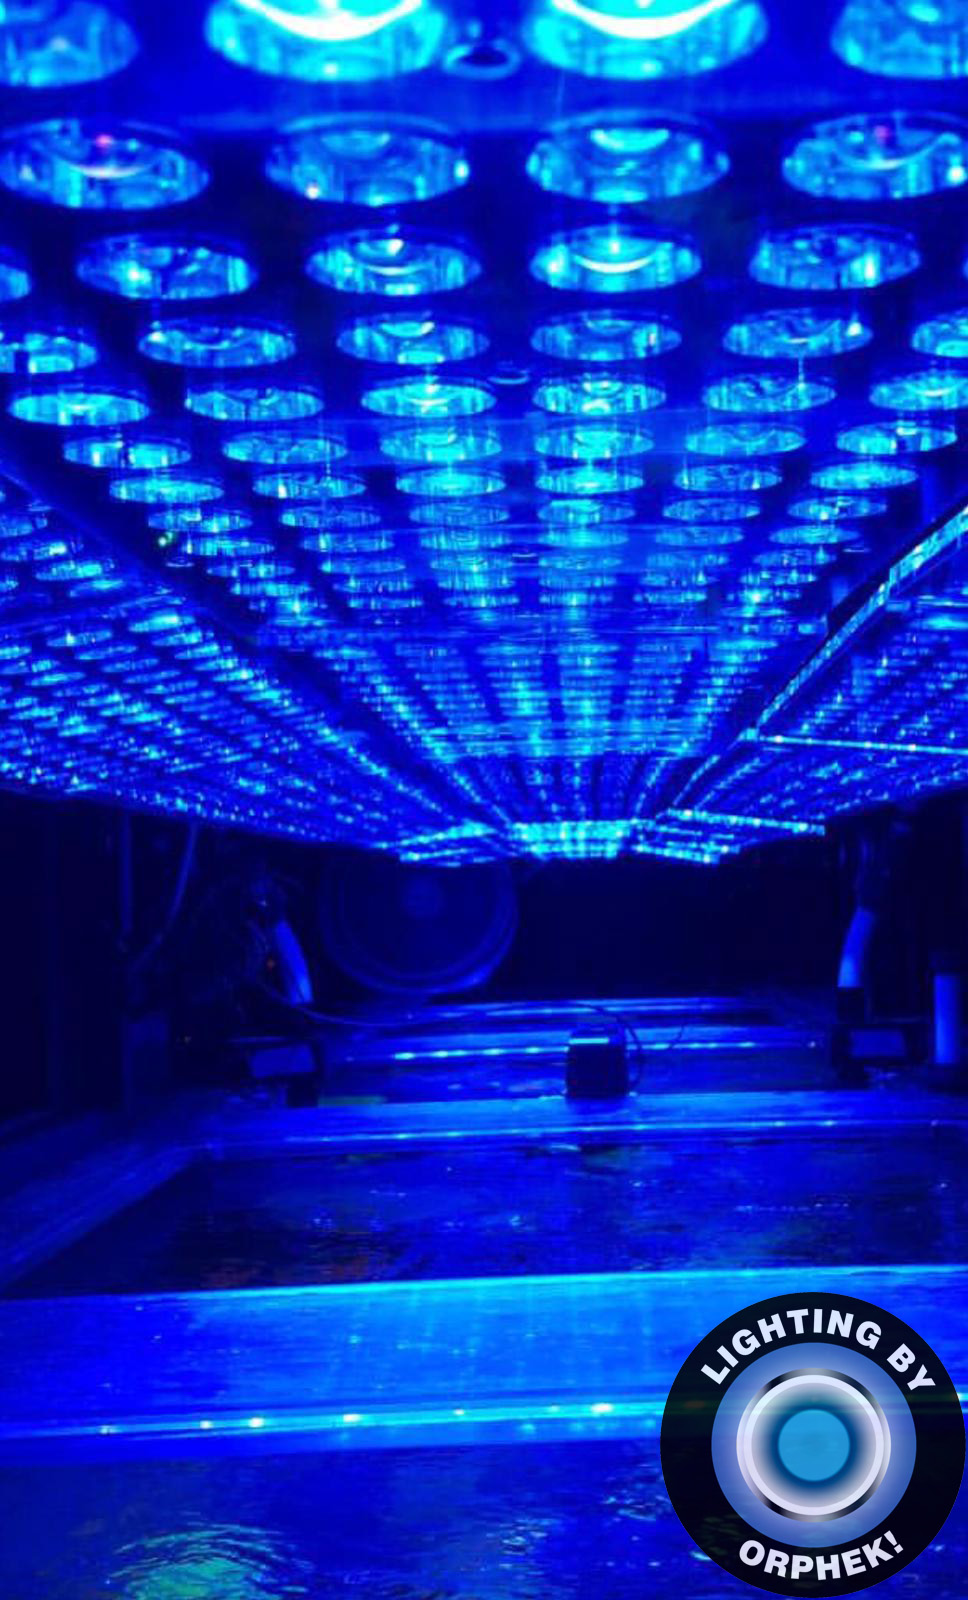 atlantik v4 bedste saltvand akvarium LED 2020